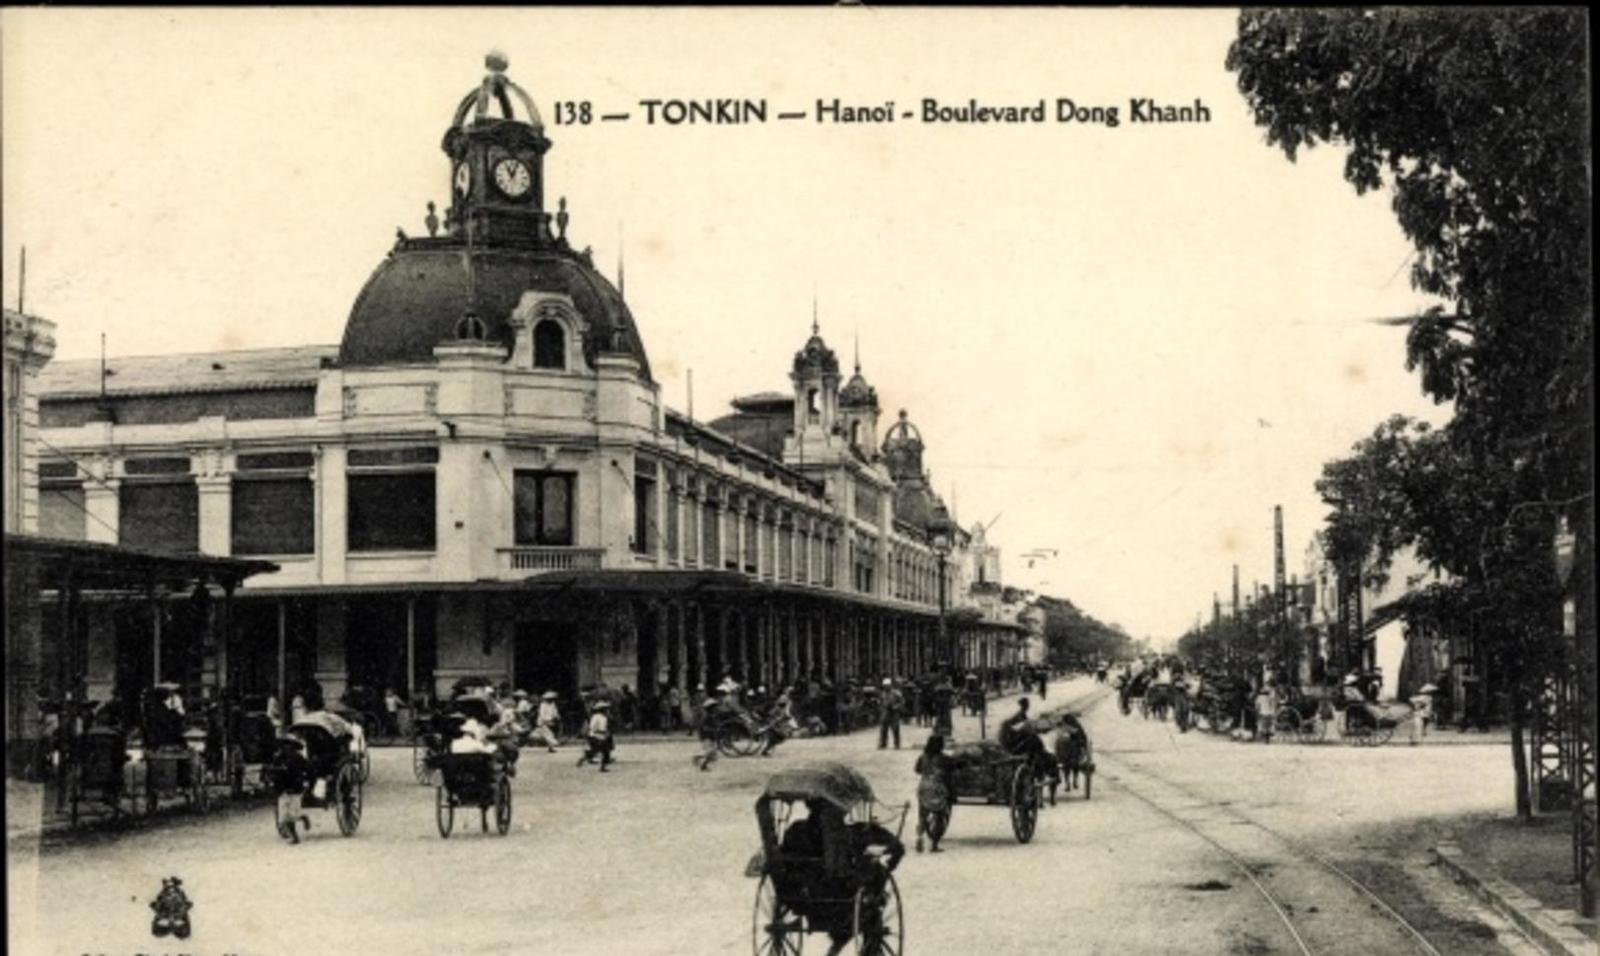 Hanoi -  Cp Hanoi Tonkin Vietnam, Boulevard Dong Khanh